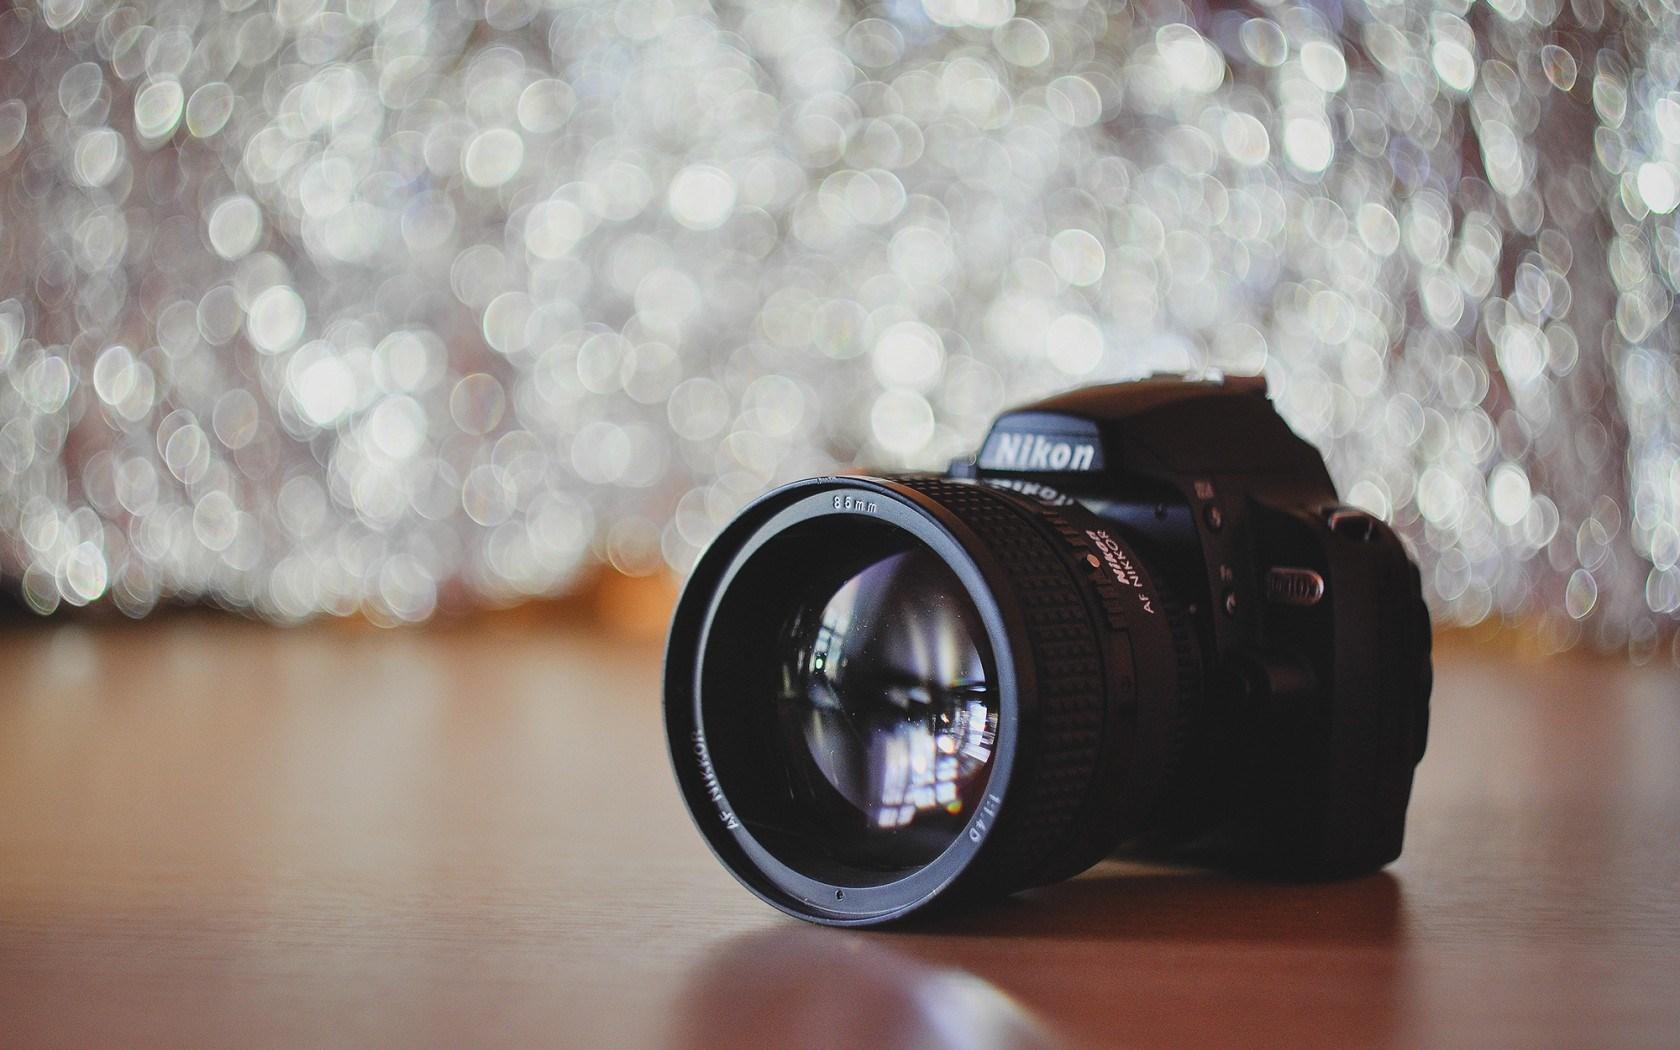 Nikon Camera Wallpaper 44826